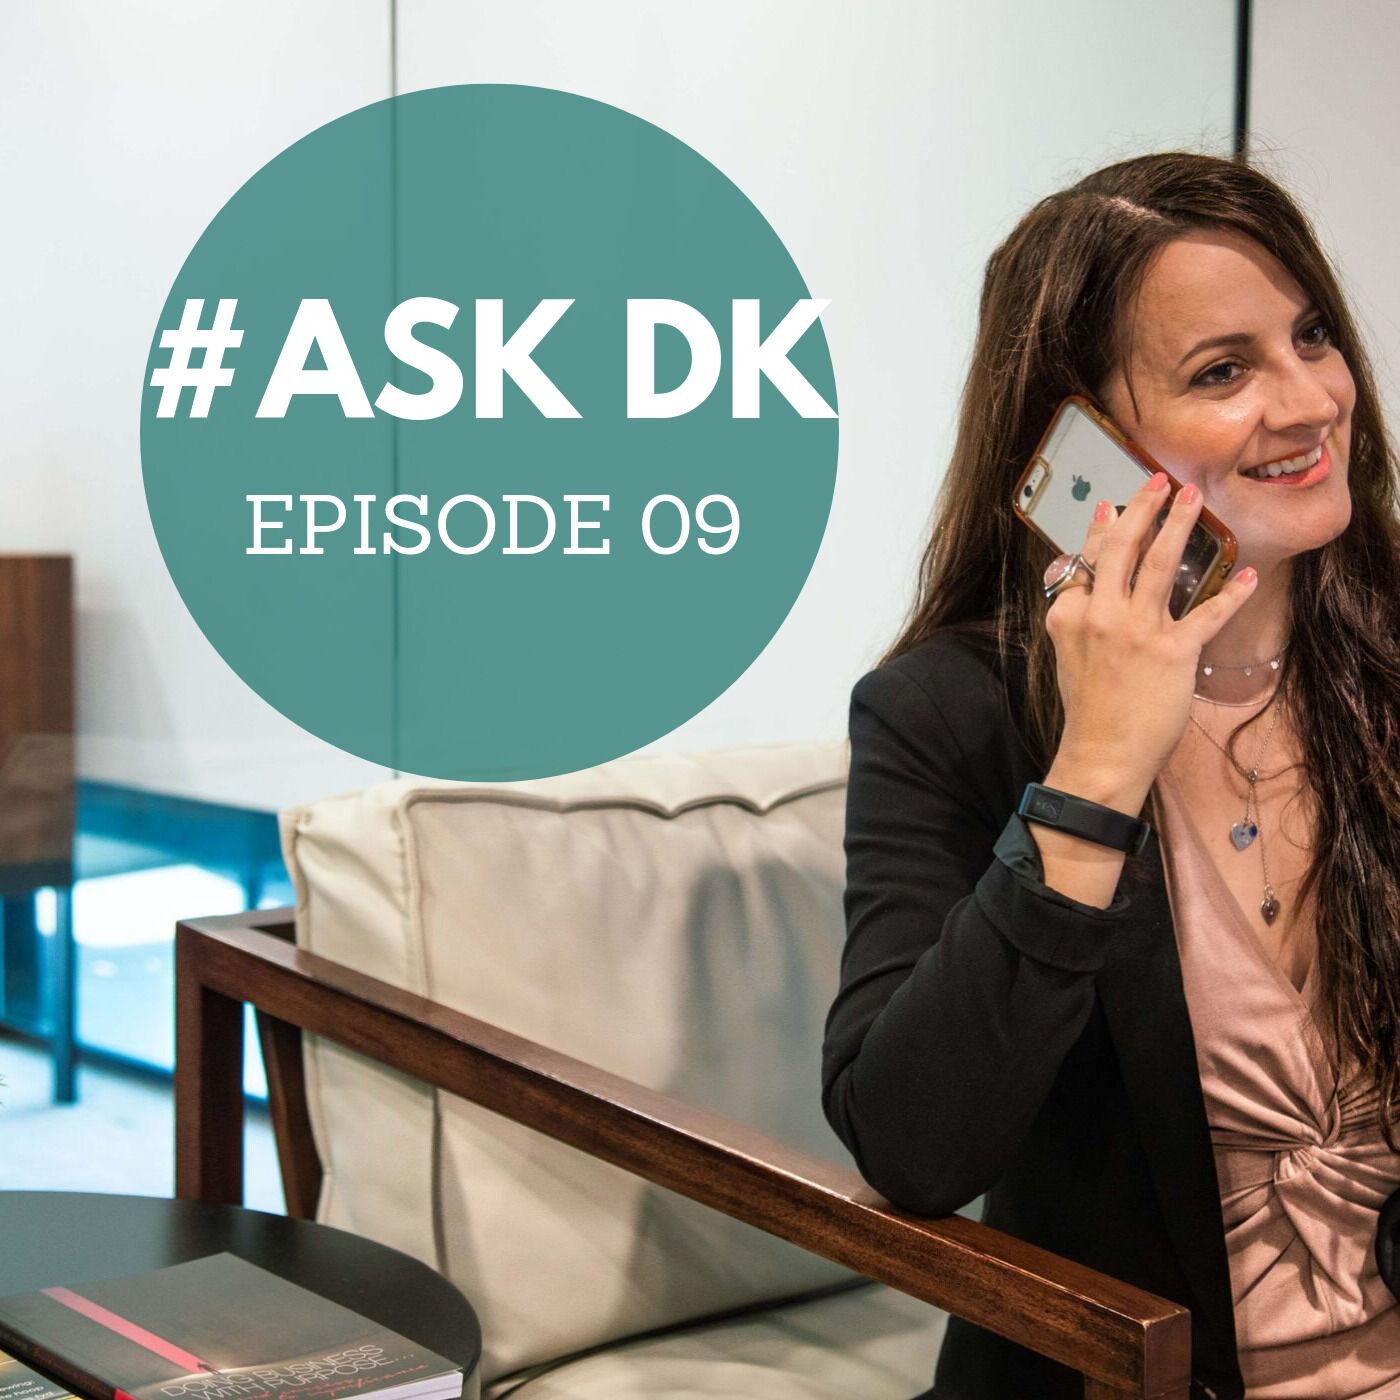 #AskDK Show - Season 1 Episode 09   Entrepreneurship, Database, Sacrifices and Company Culture